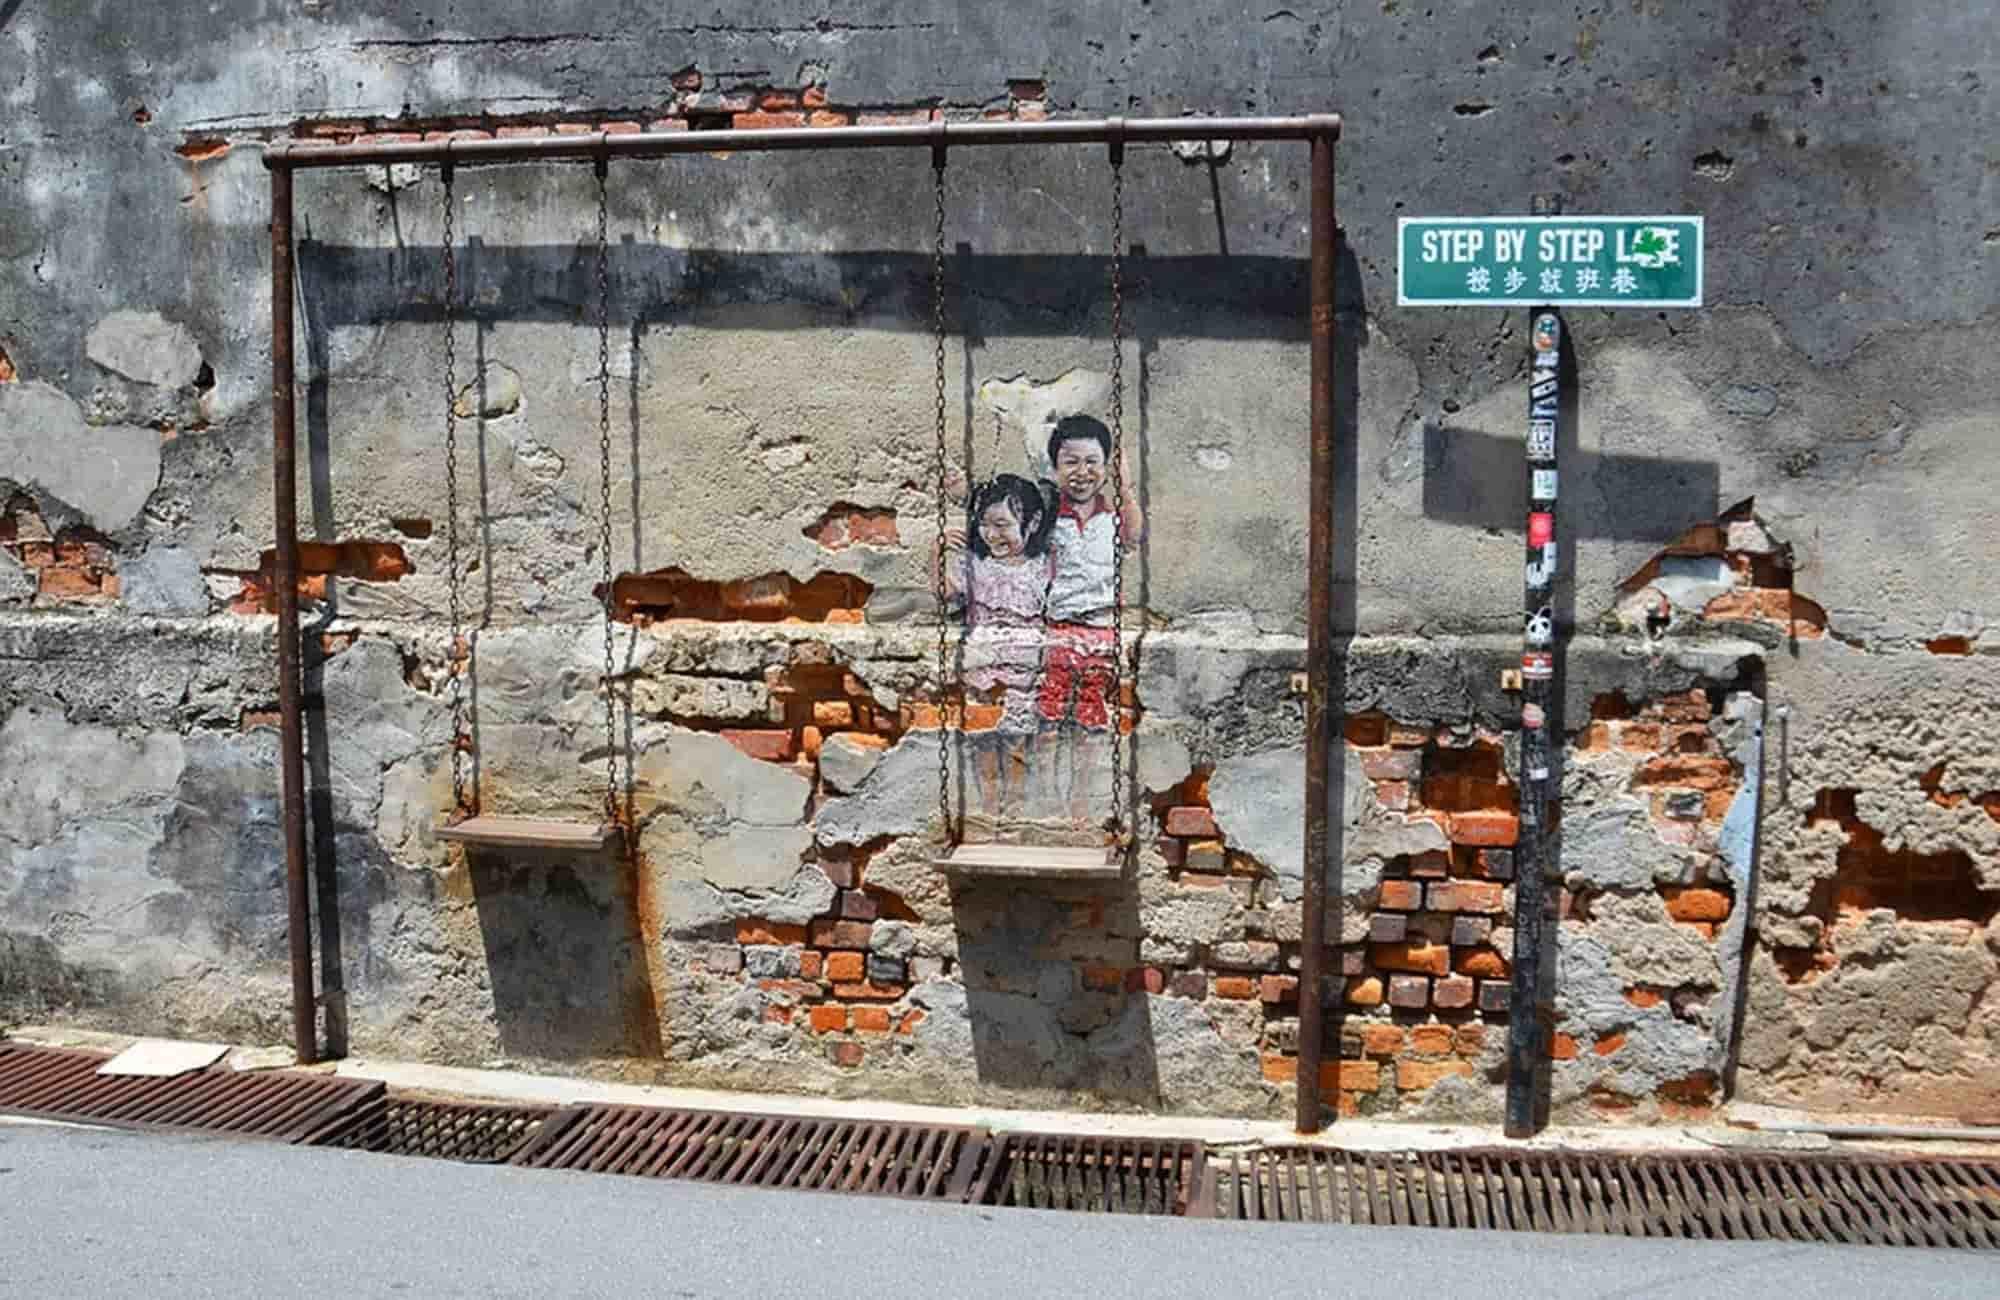 Voyage en Malaisie - Street-art à George town - Amplitudes